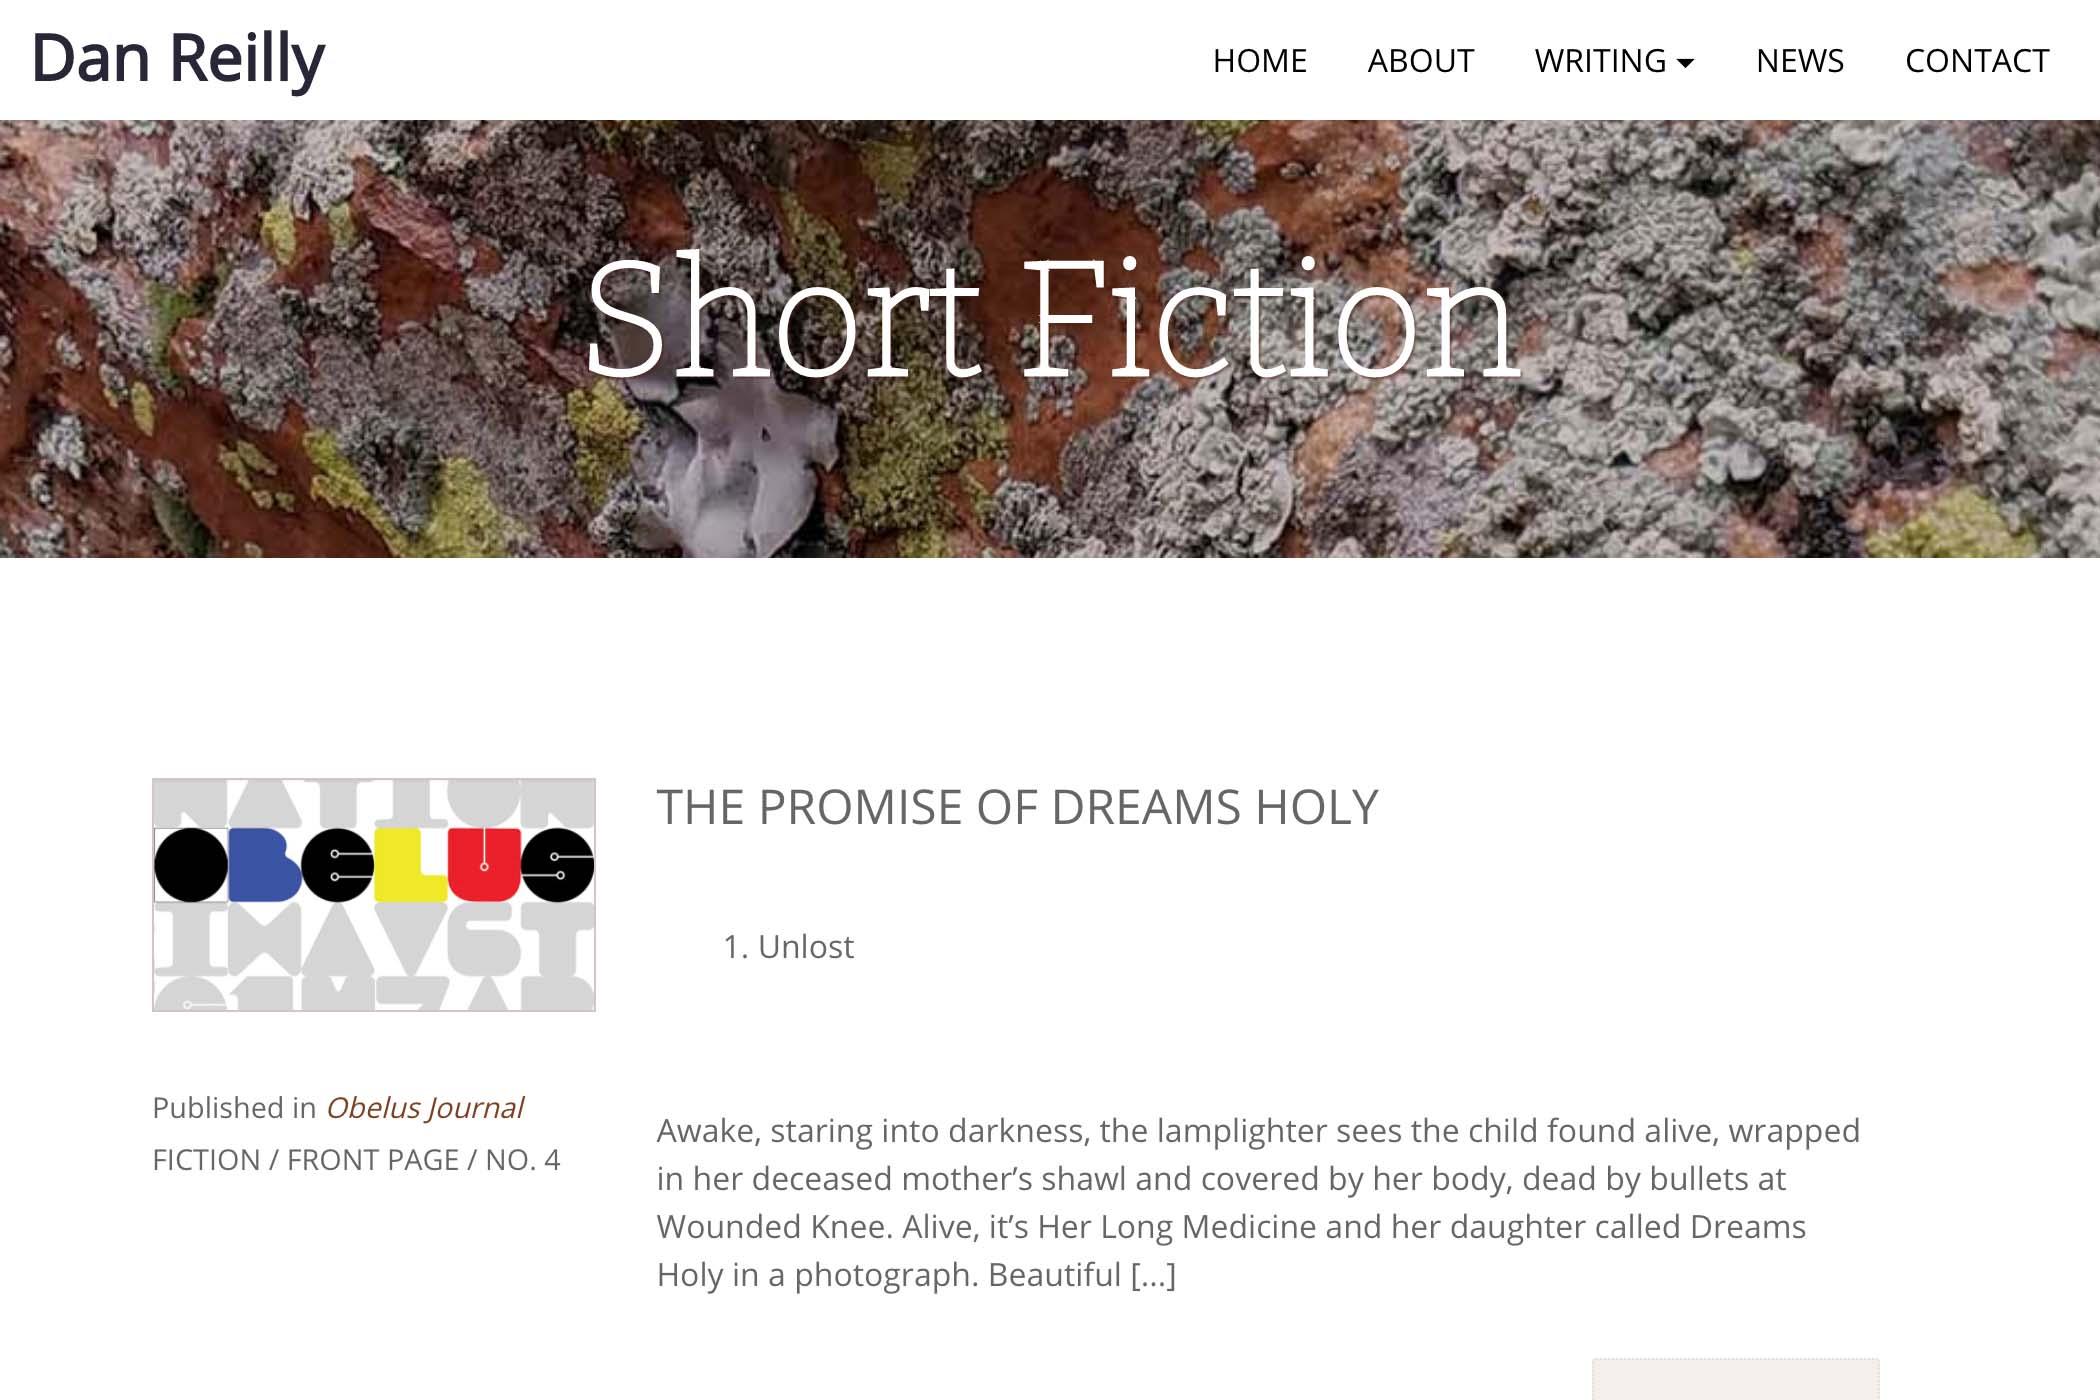 website design for a writer - short fiction page